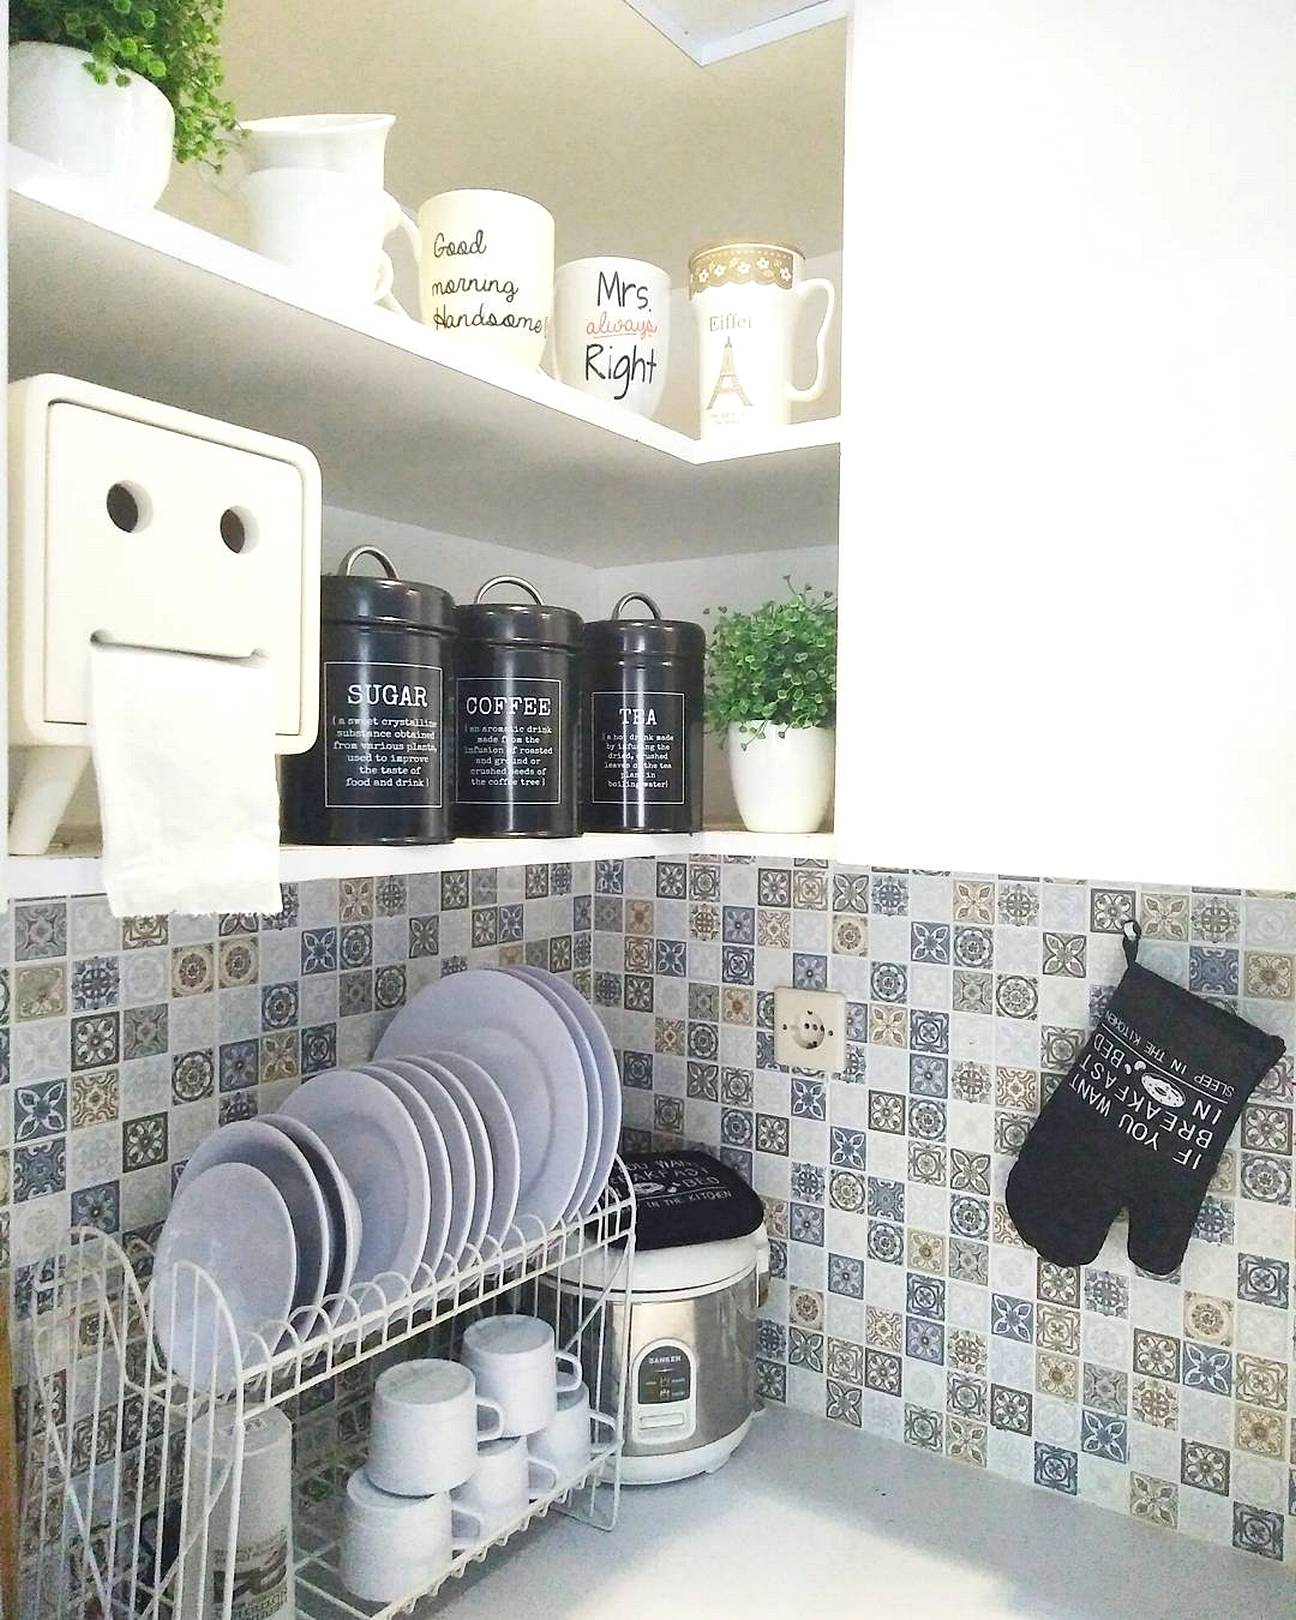 Contoh Tile Dinding Dapur Desainrumahid com